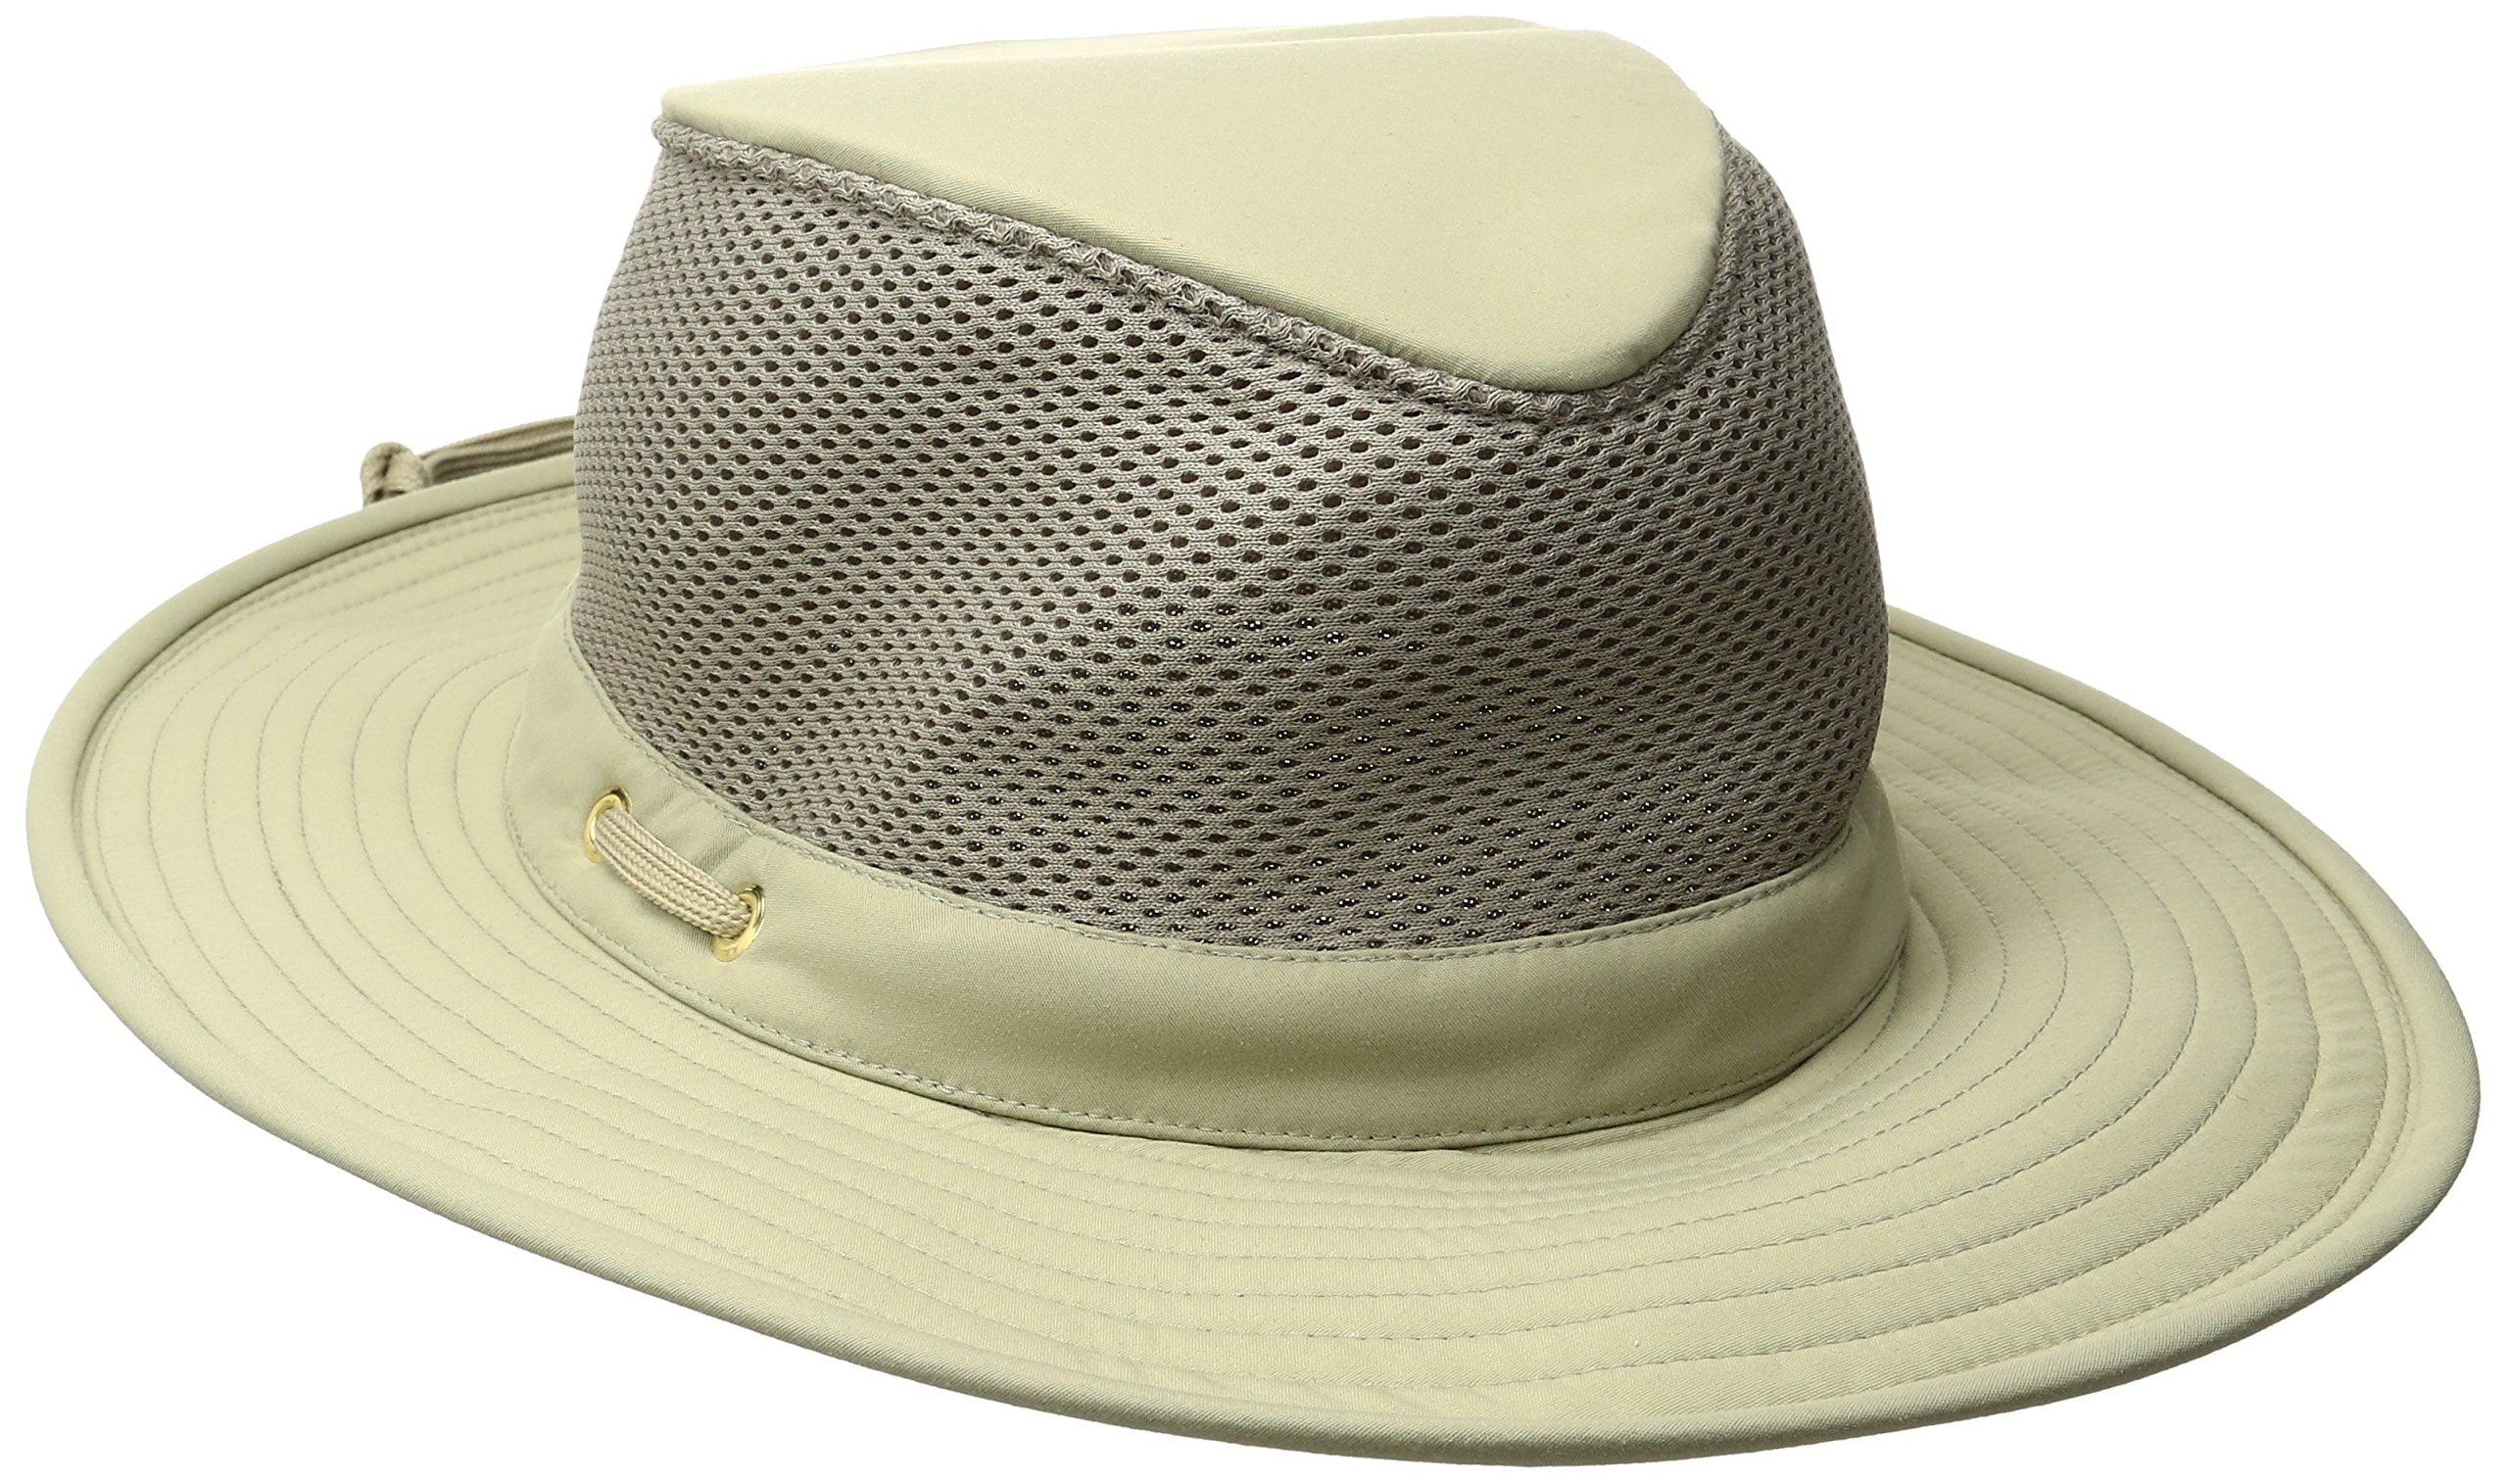 2932623e7 tilley endurables ltm8 nylamtium hat with mesh - khaki - 7 3/8